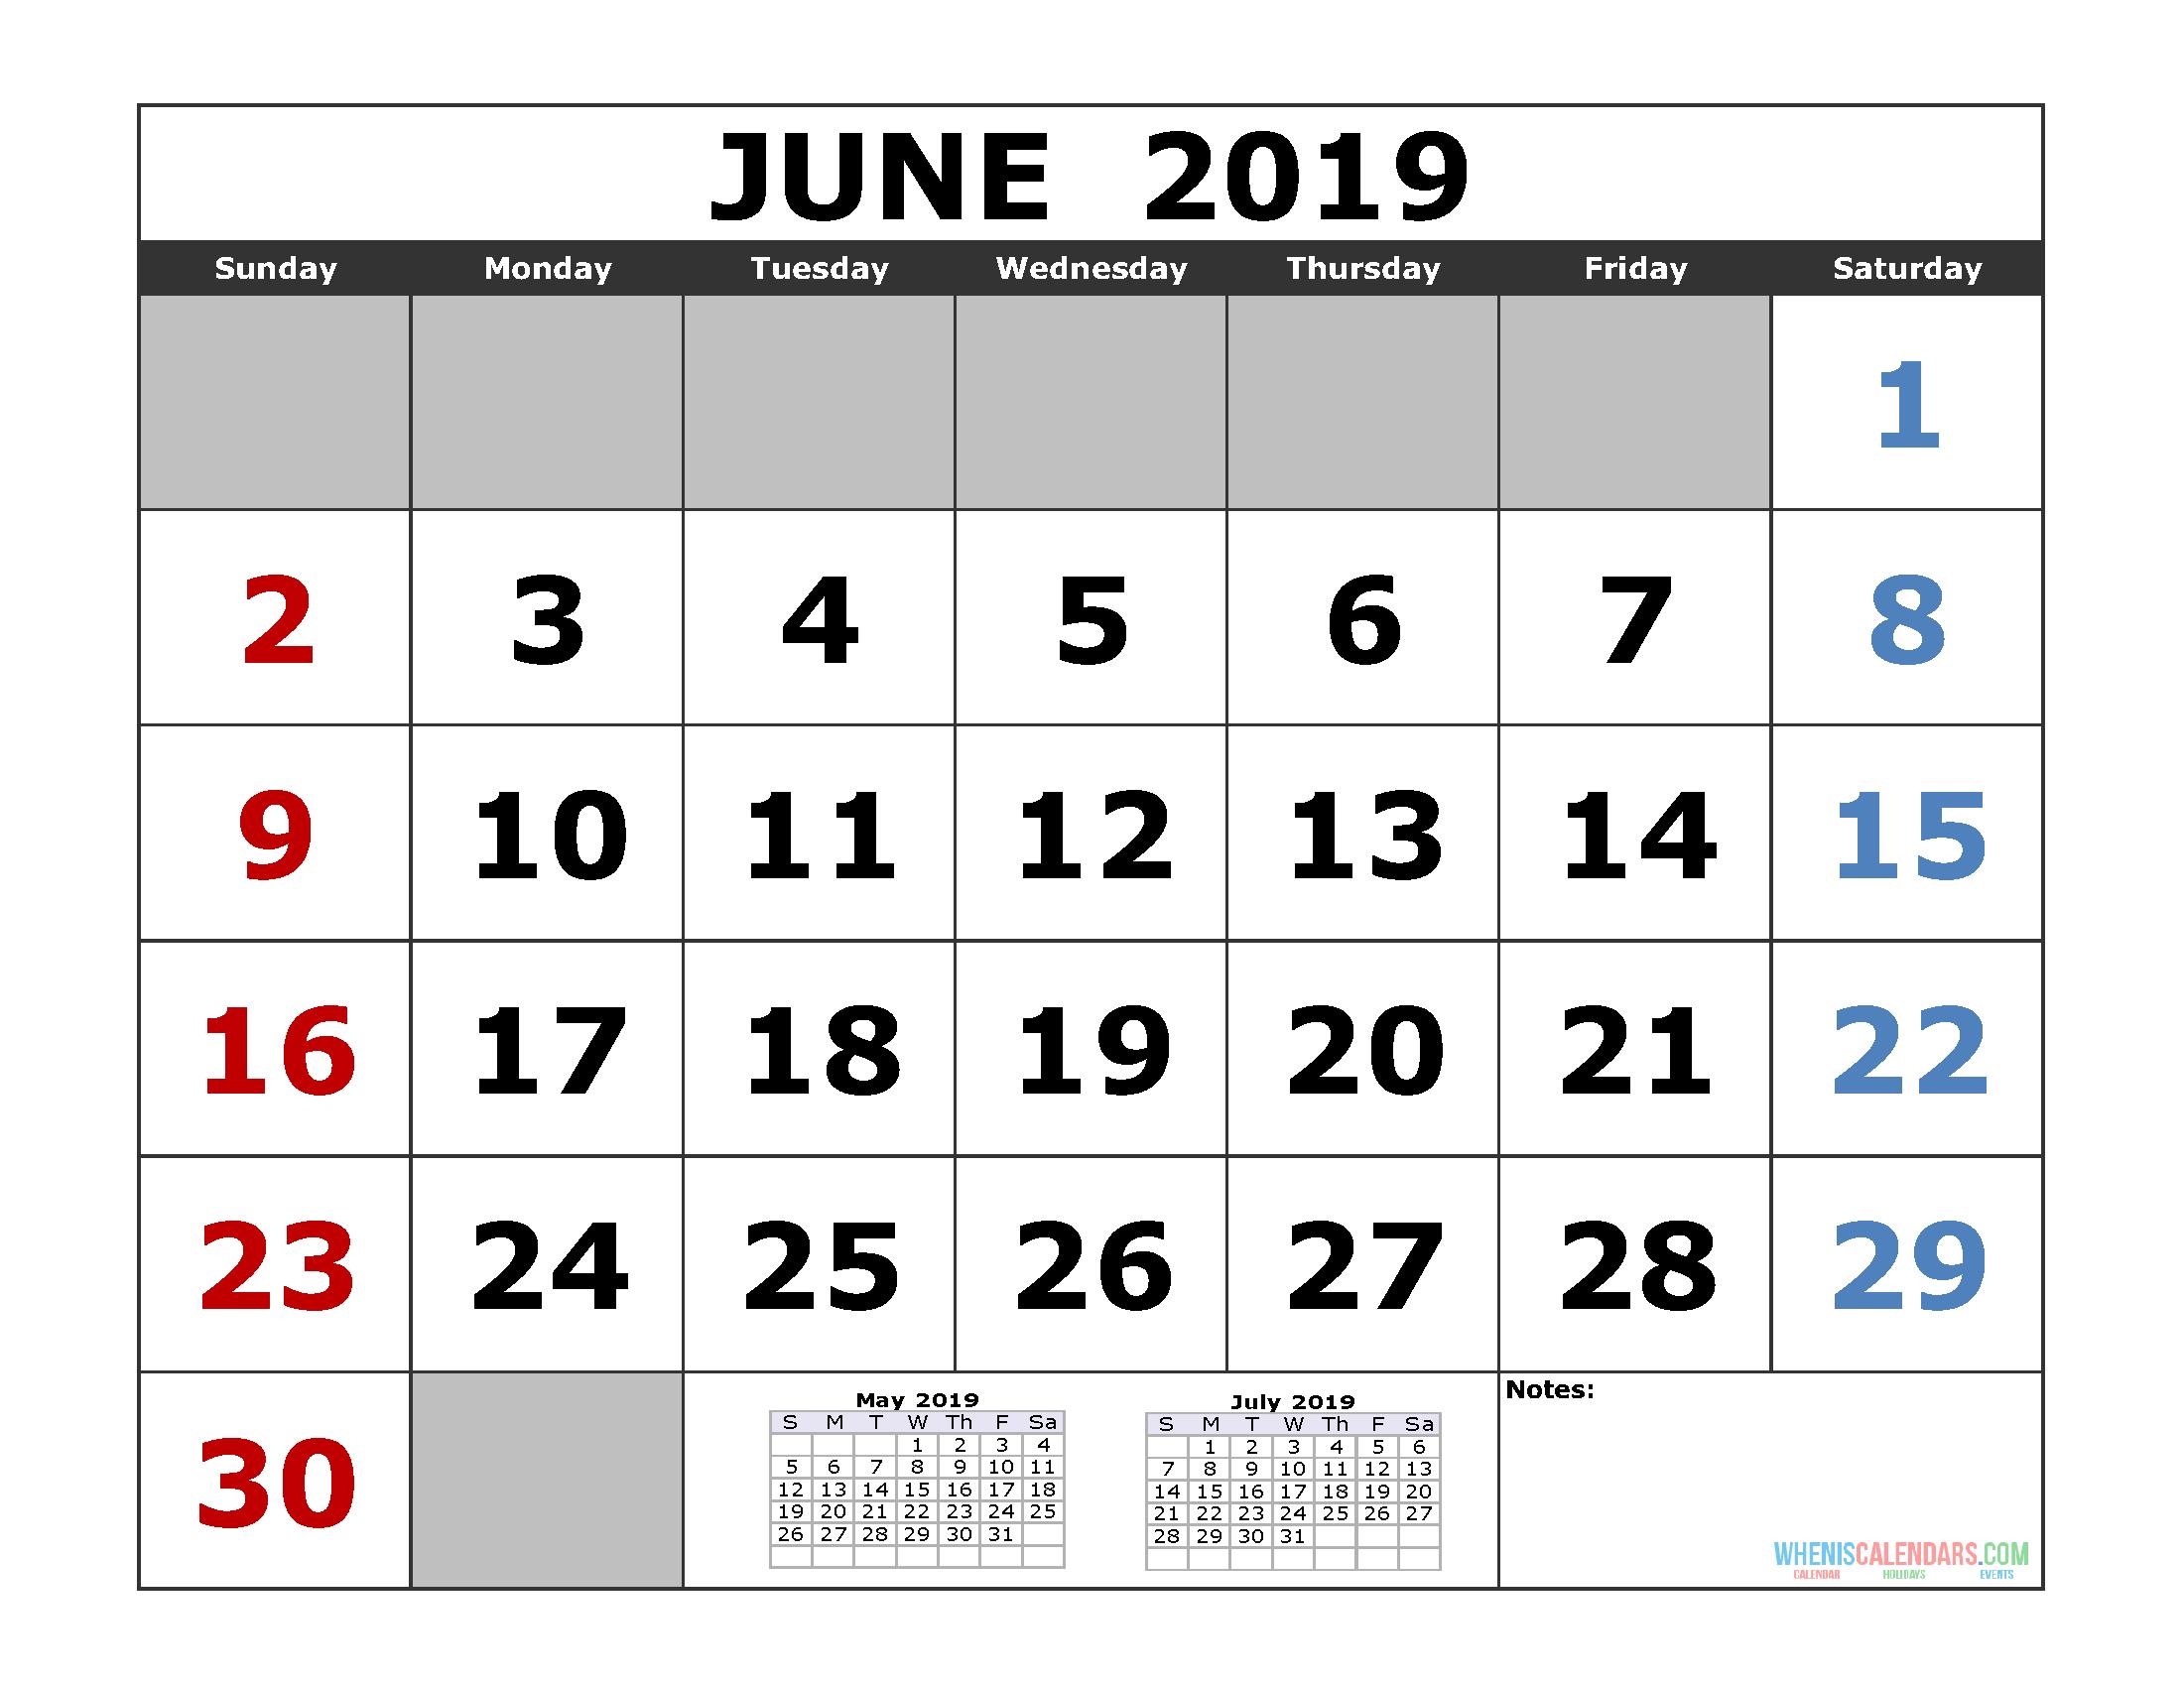 Free June 2019 Printable Calendar Templates [Us. Edition] | Free June 4 2019 Calendar